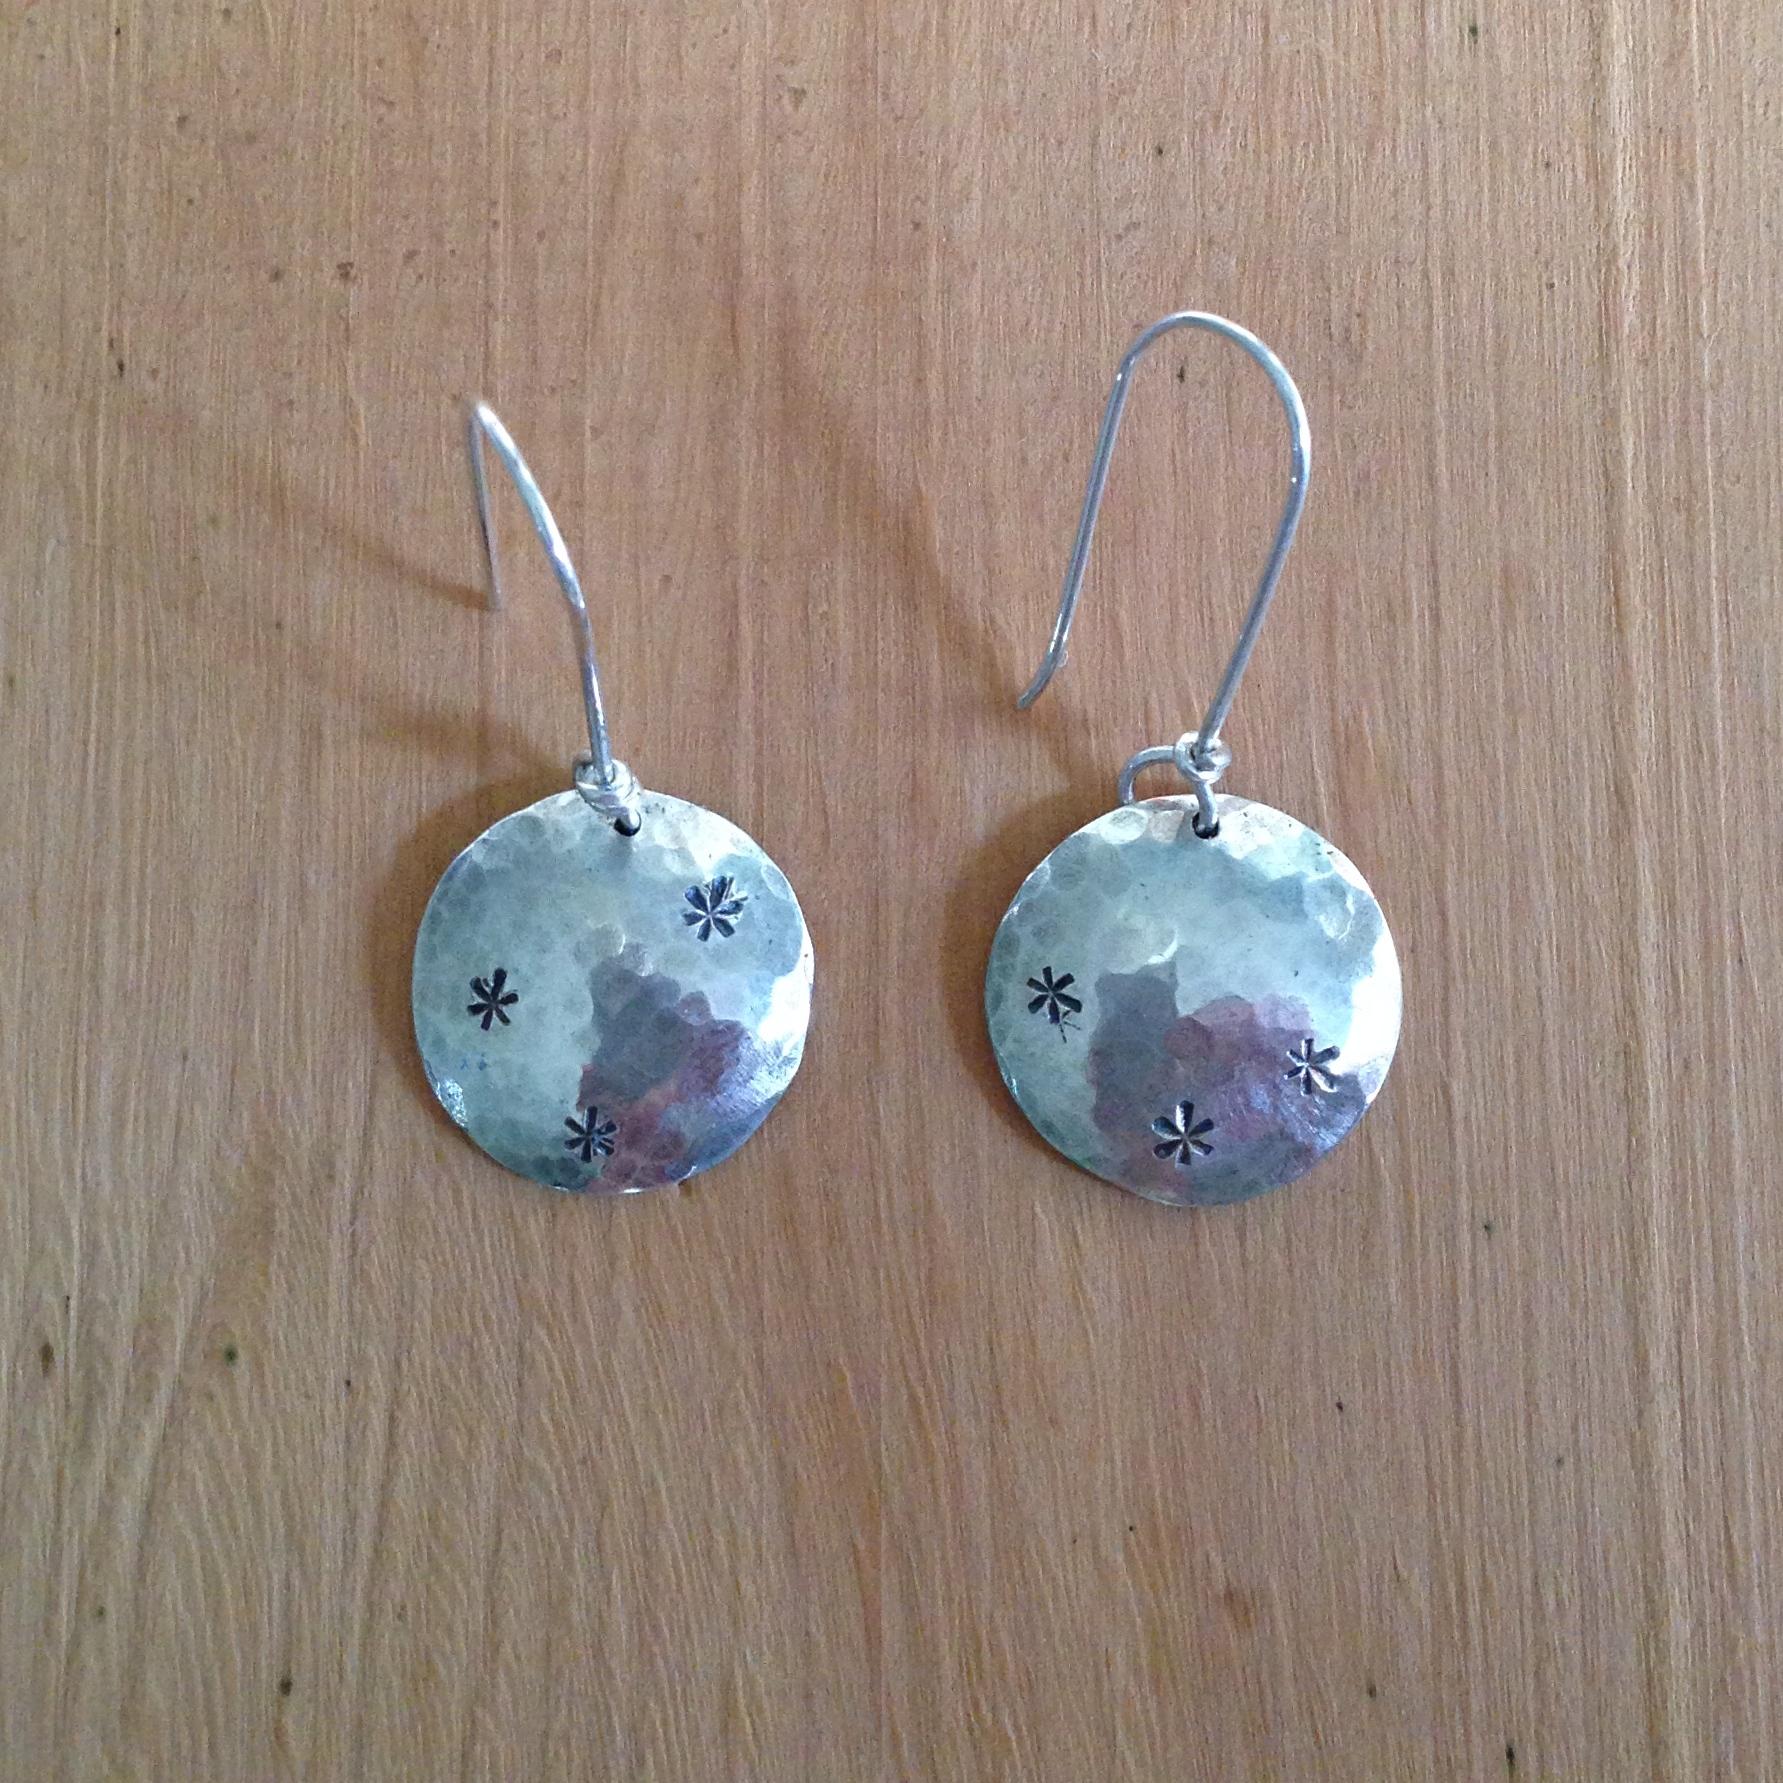 star-textured-circle-earrings